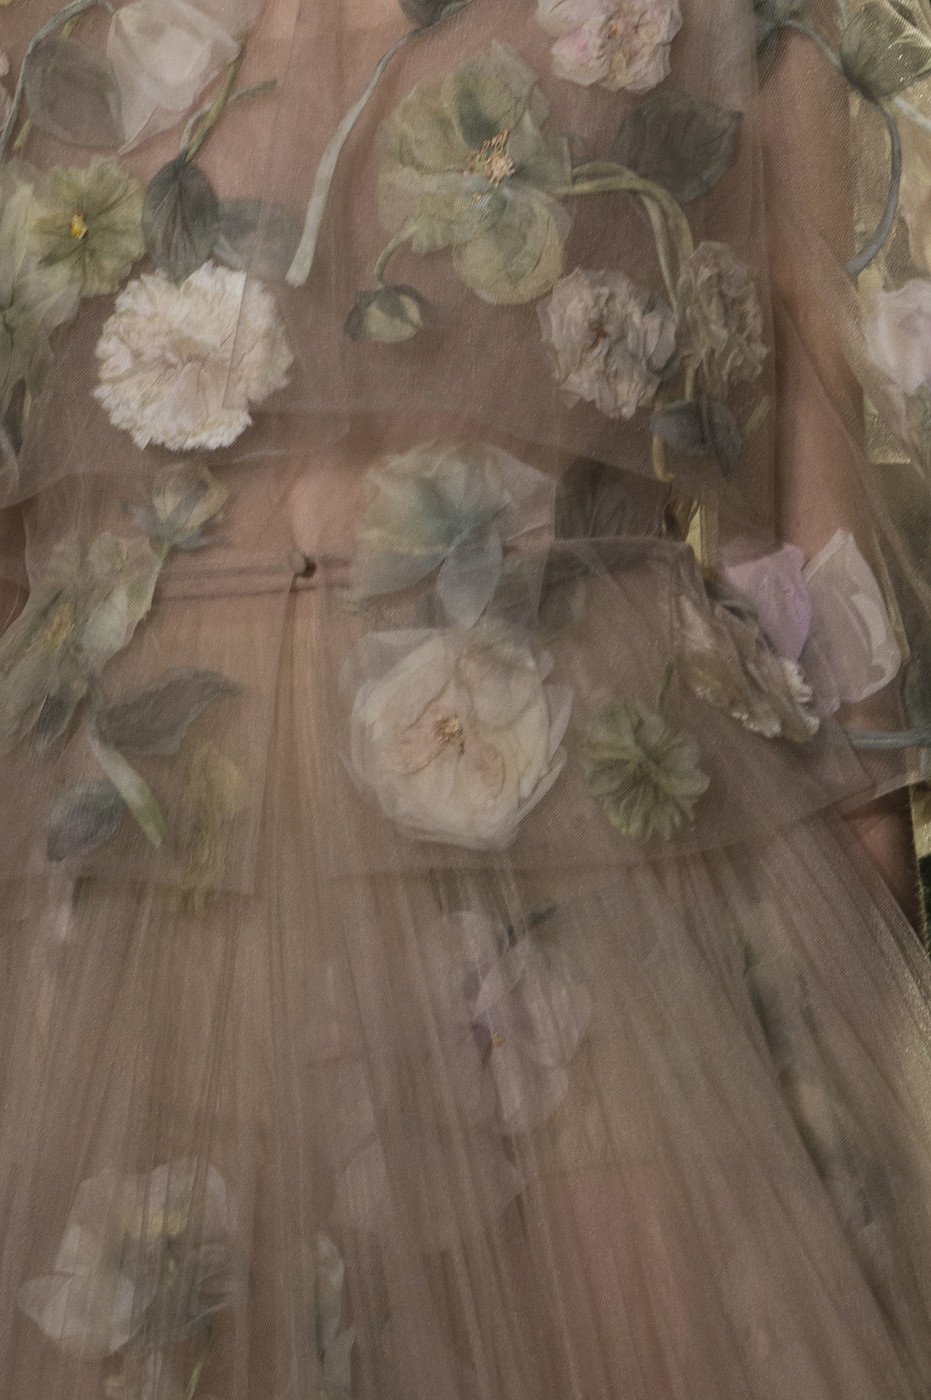 Christian+Dior+Spring+2017+Details+xlU9Z_XUiw8x.jpg